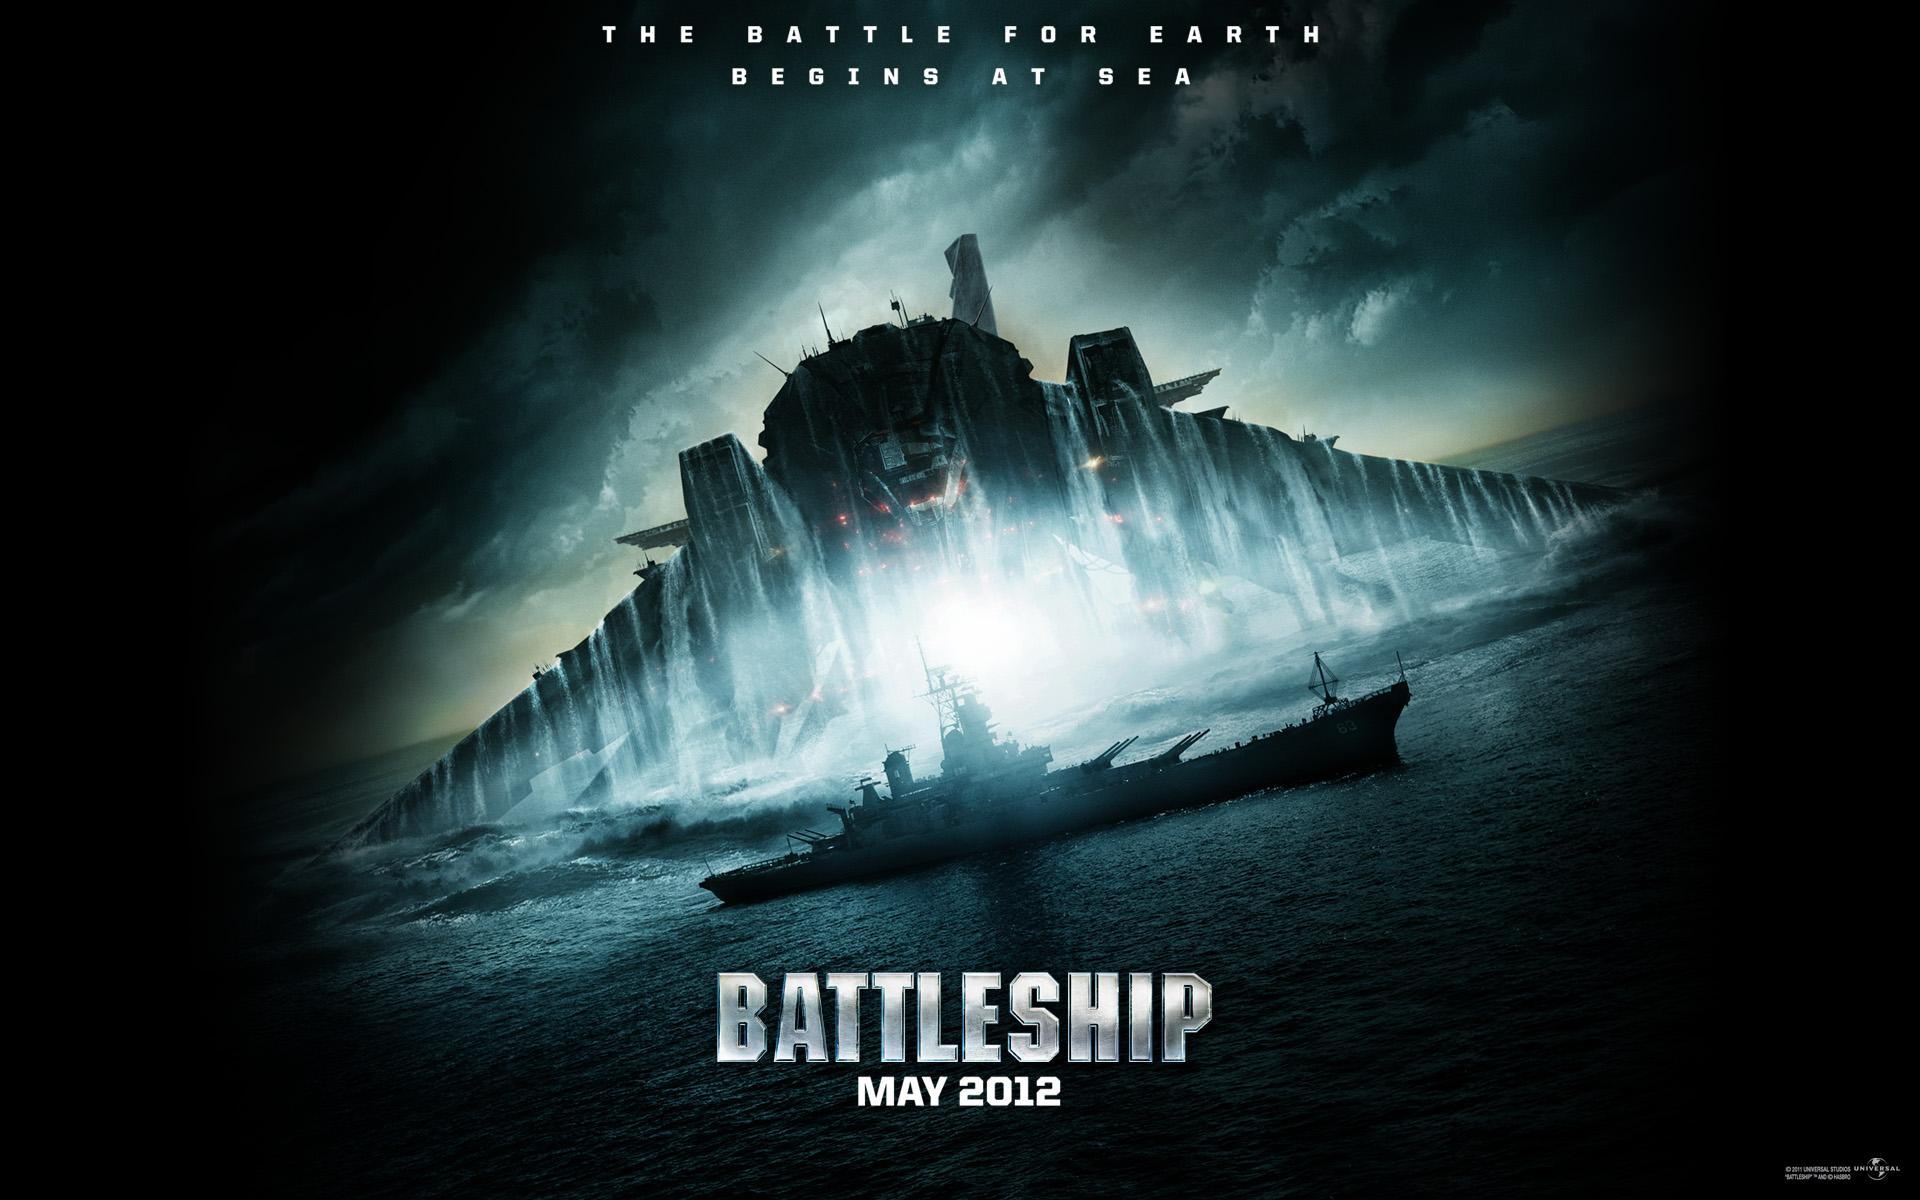 battleship wallpapers hd - wallpapersafari